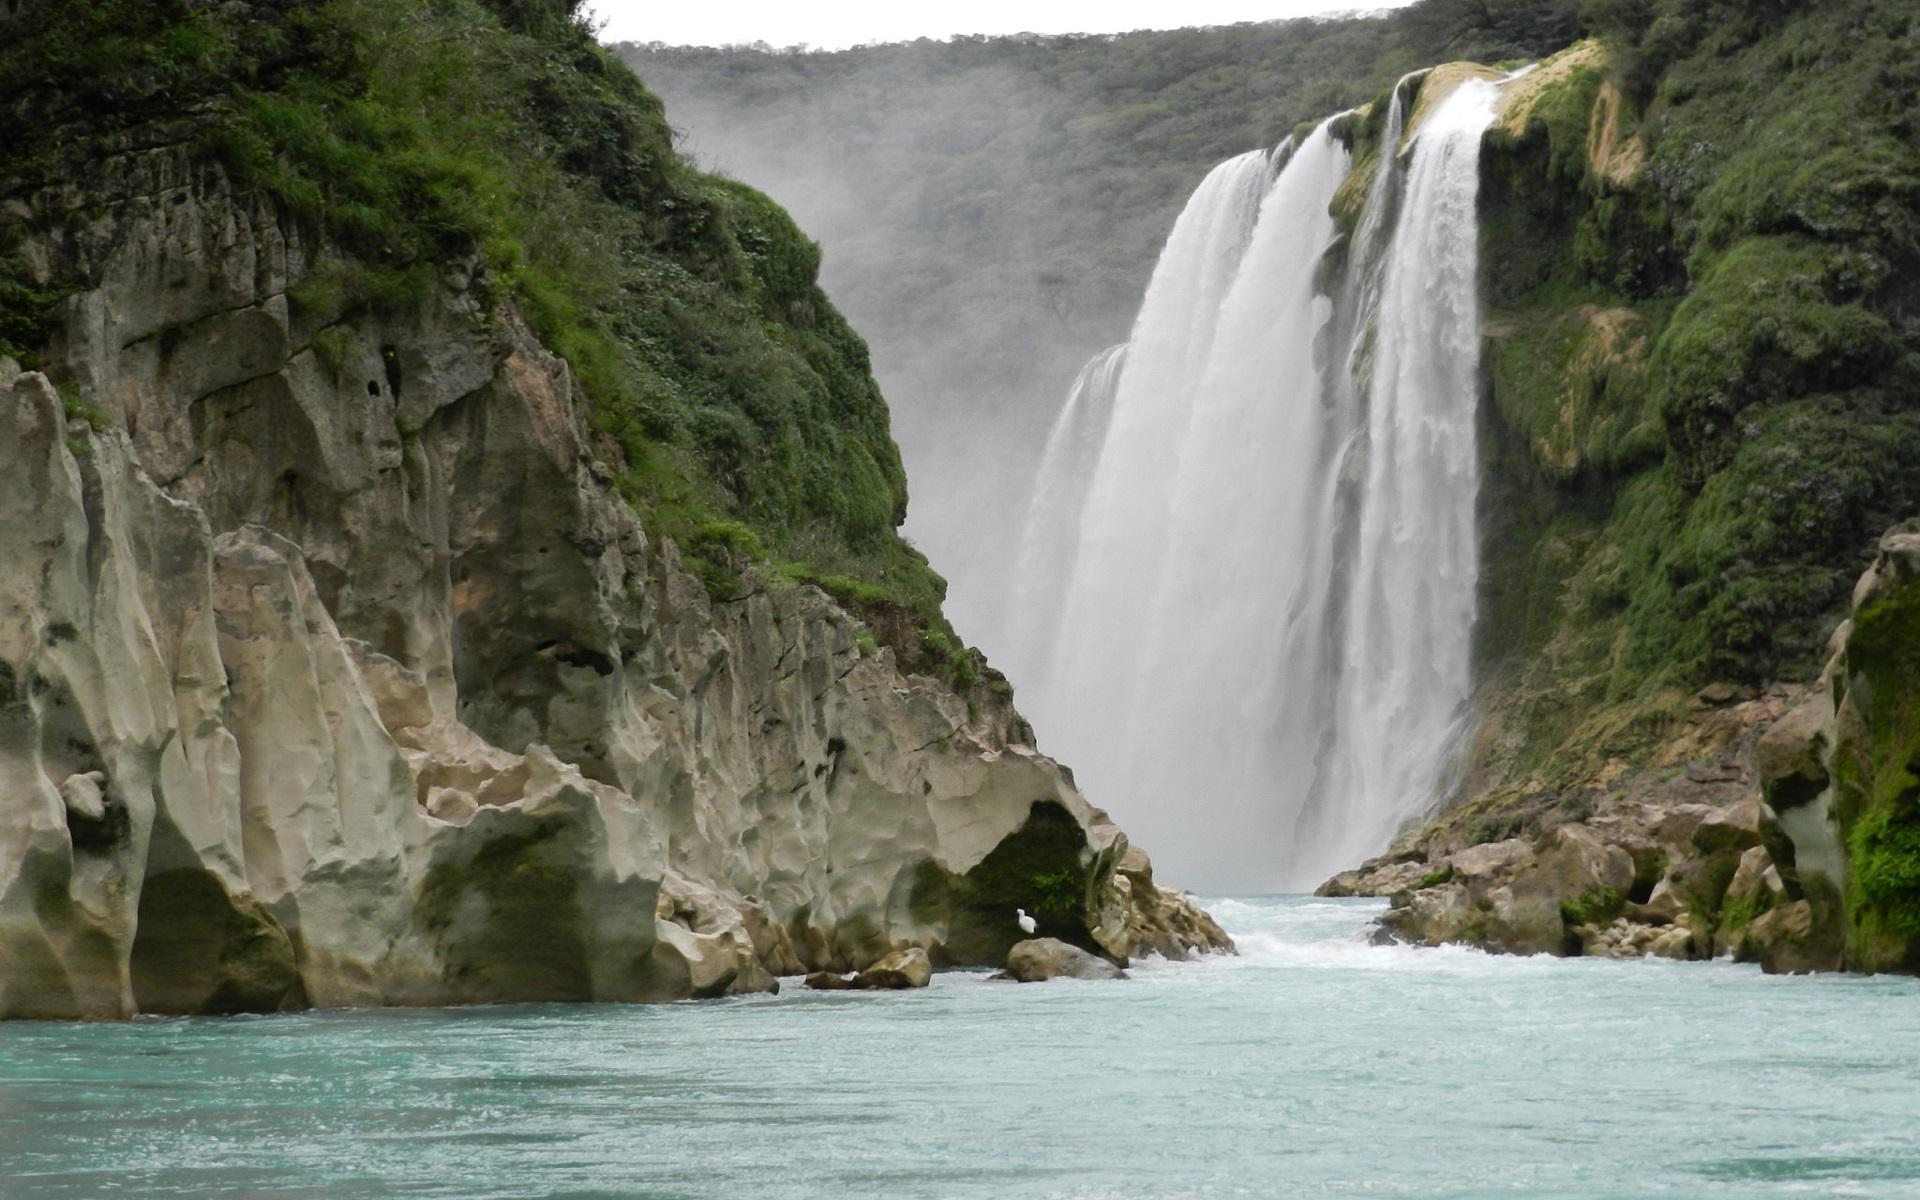 Falls Hd Wallpaper Free Download Waterfall Wallpaper High Quality Pixelstalk Net